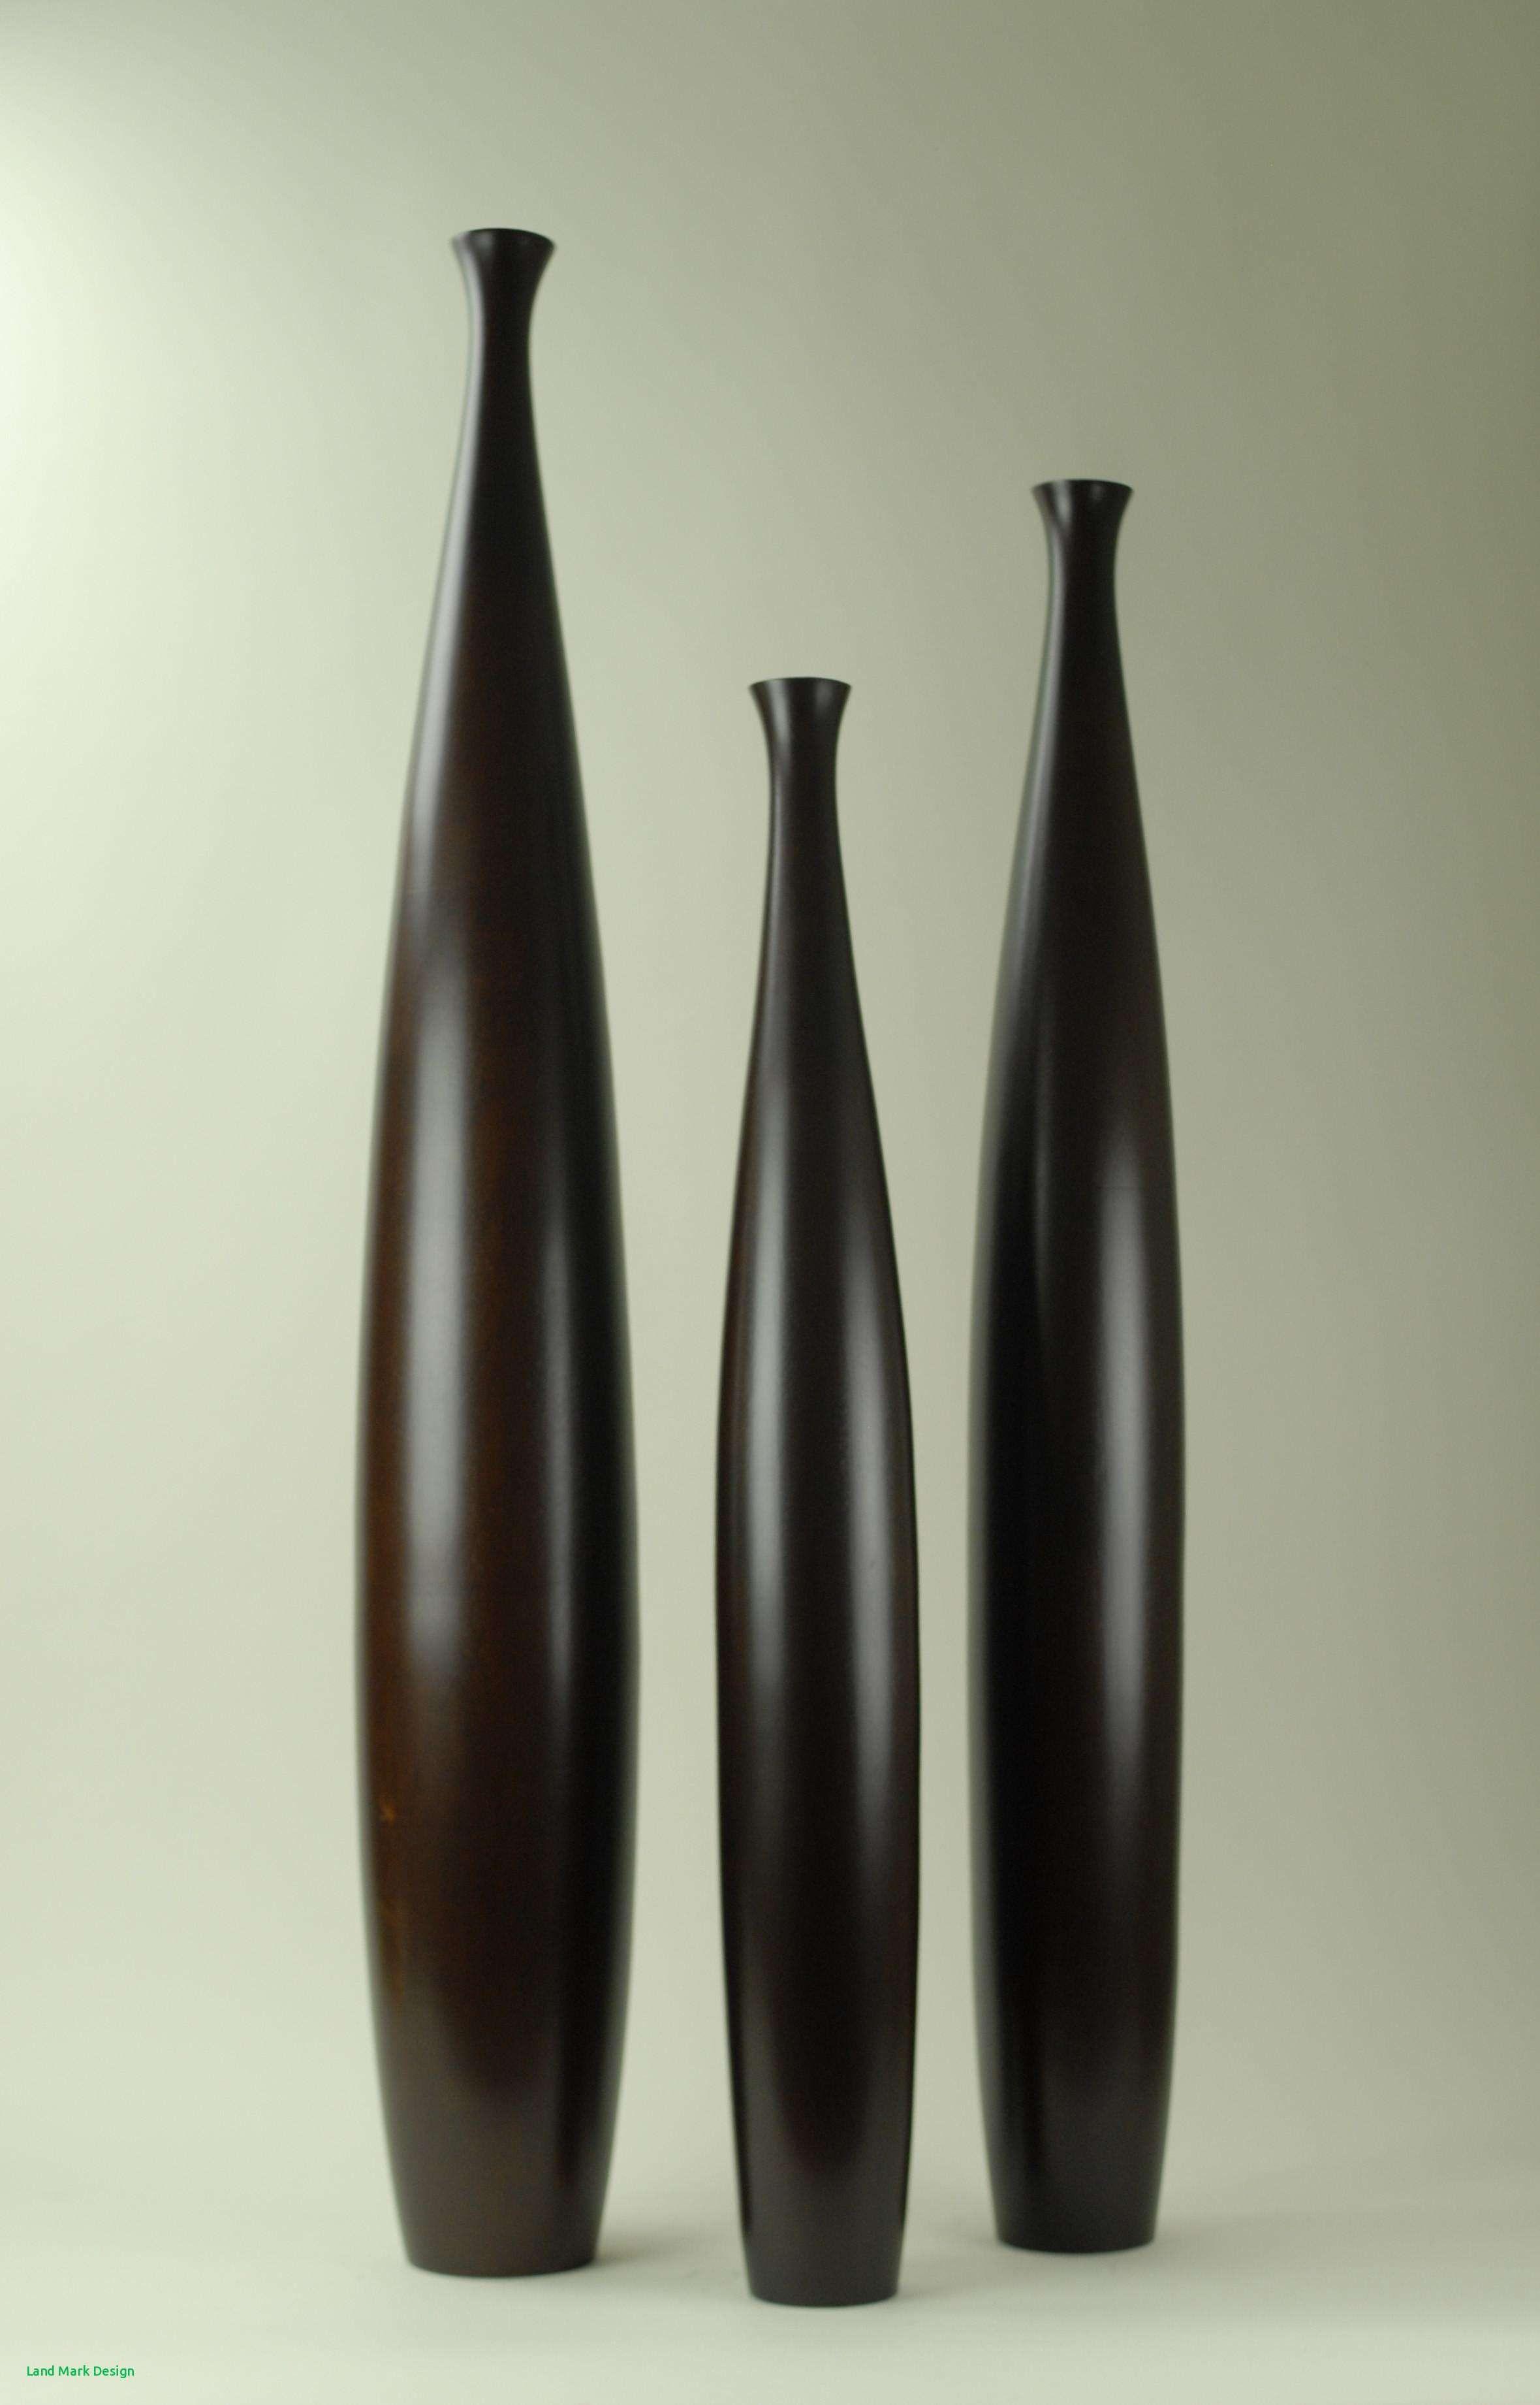 decorative vase set of 30 large floor vase the weekly world for white floor vase ceramic modern 40 inchl home design ikea inch